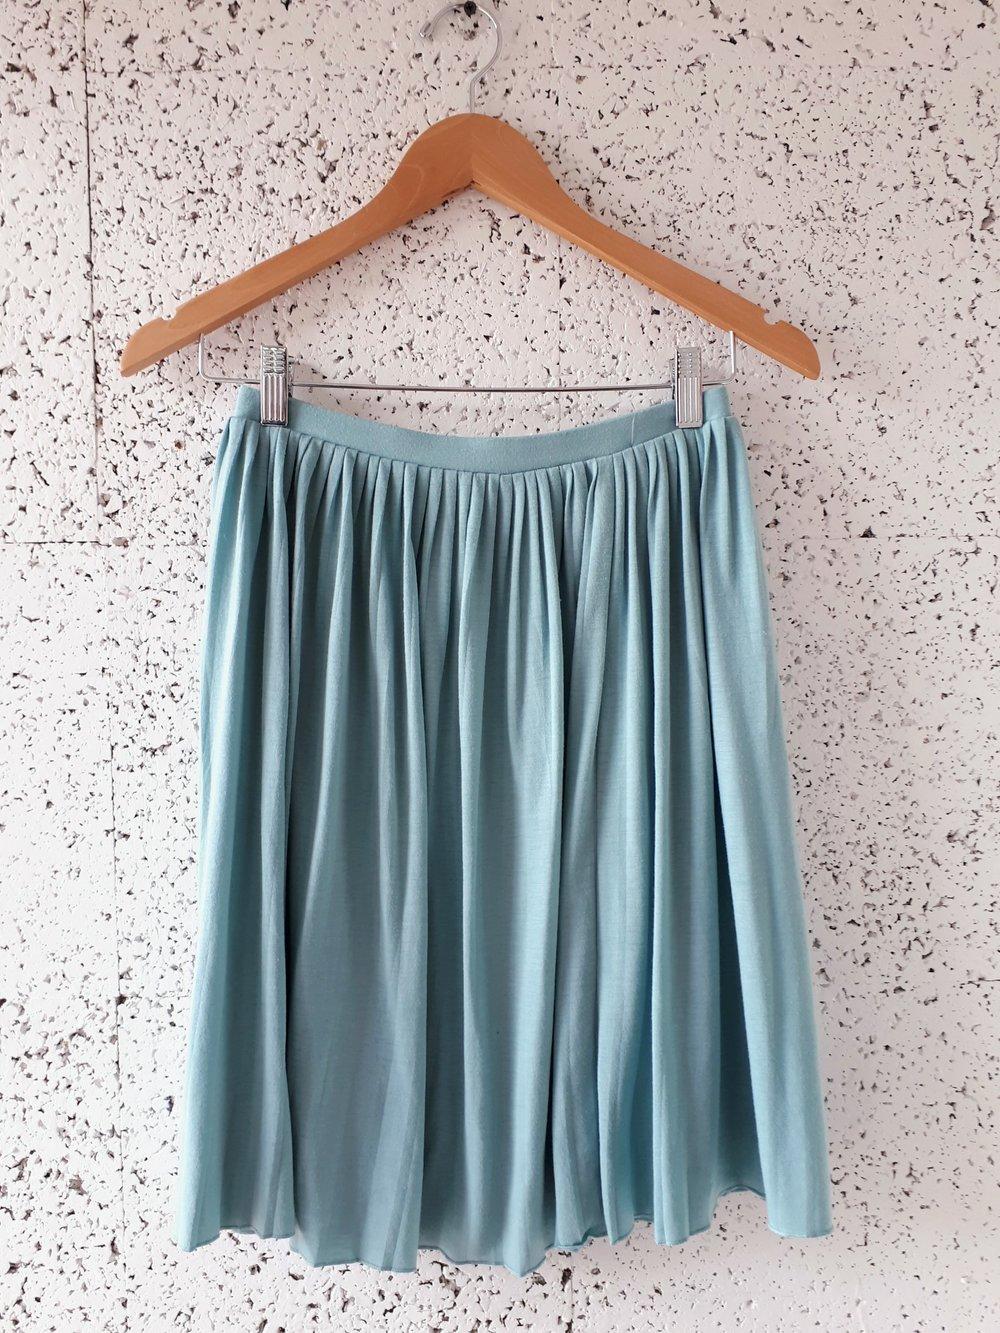 Uniqlo skirt; Size S, $24